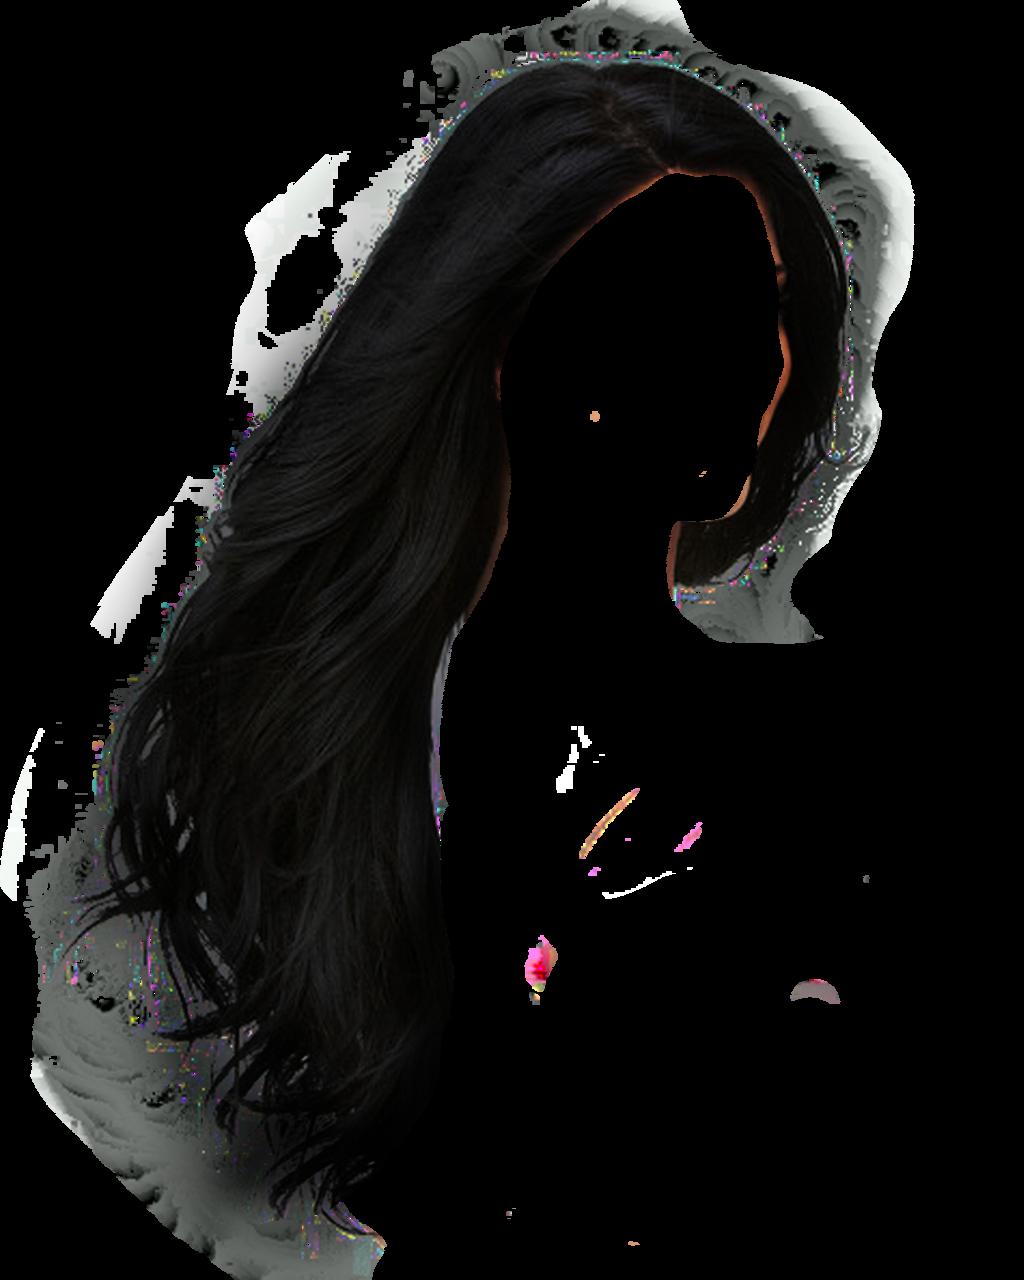 Download Hair Transparent Background Hq Png Image Freepngimg